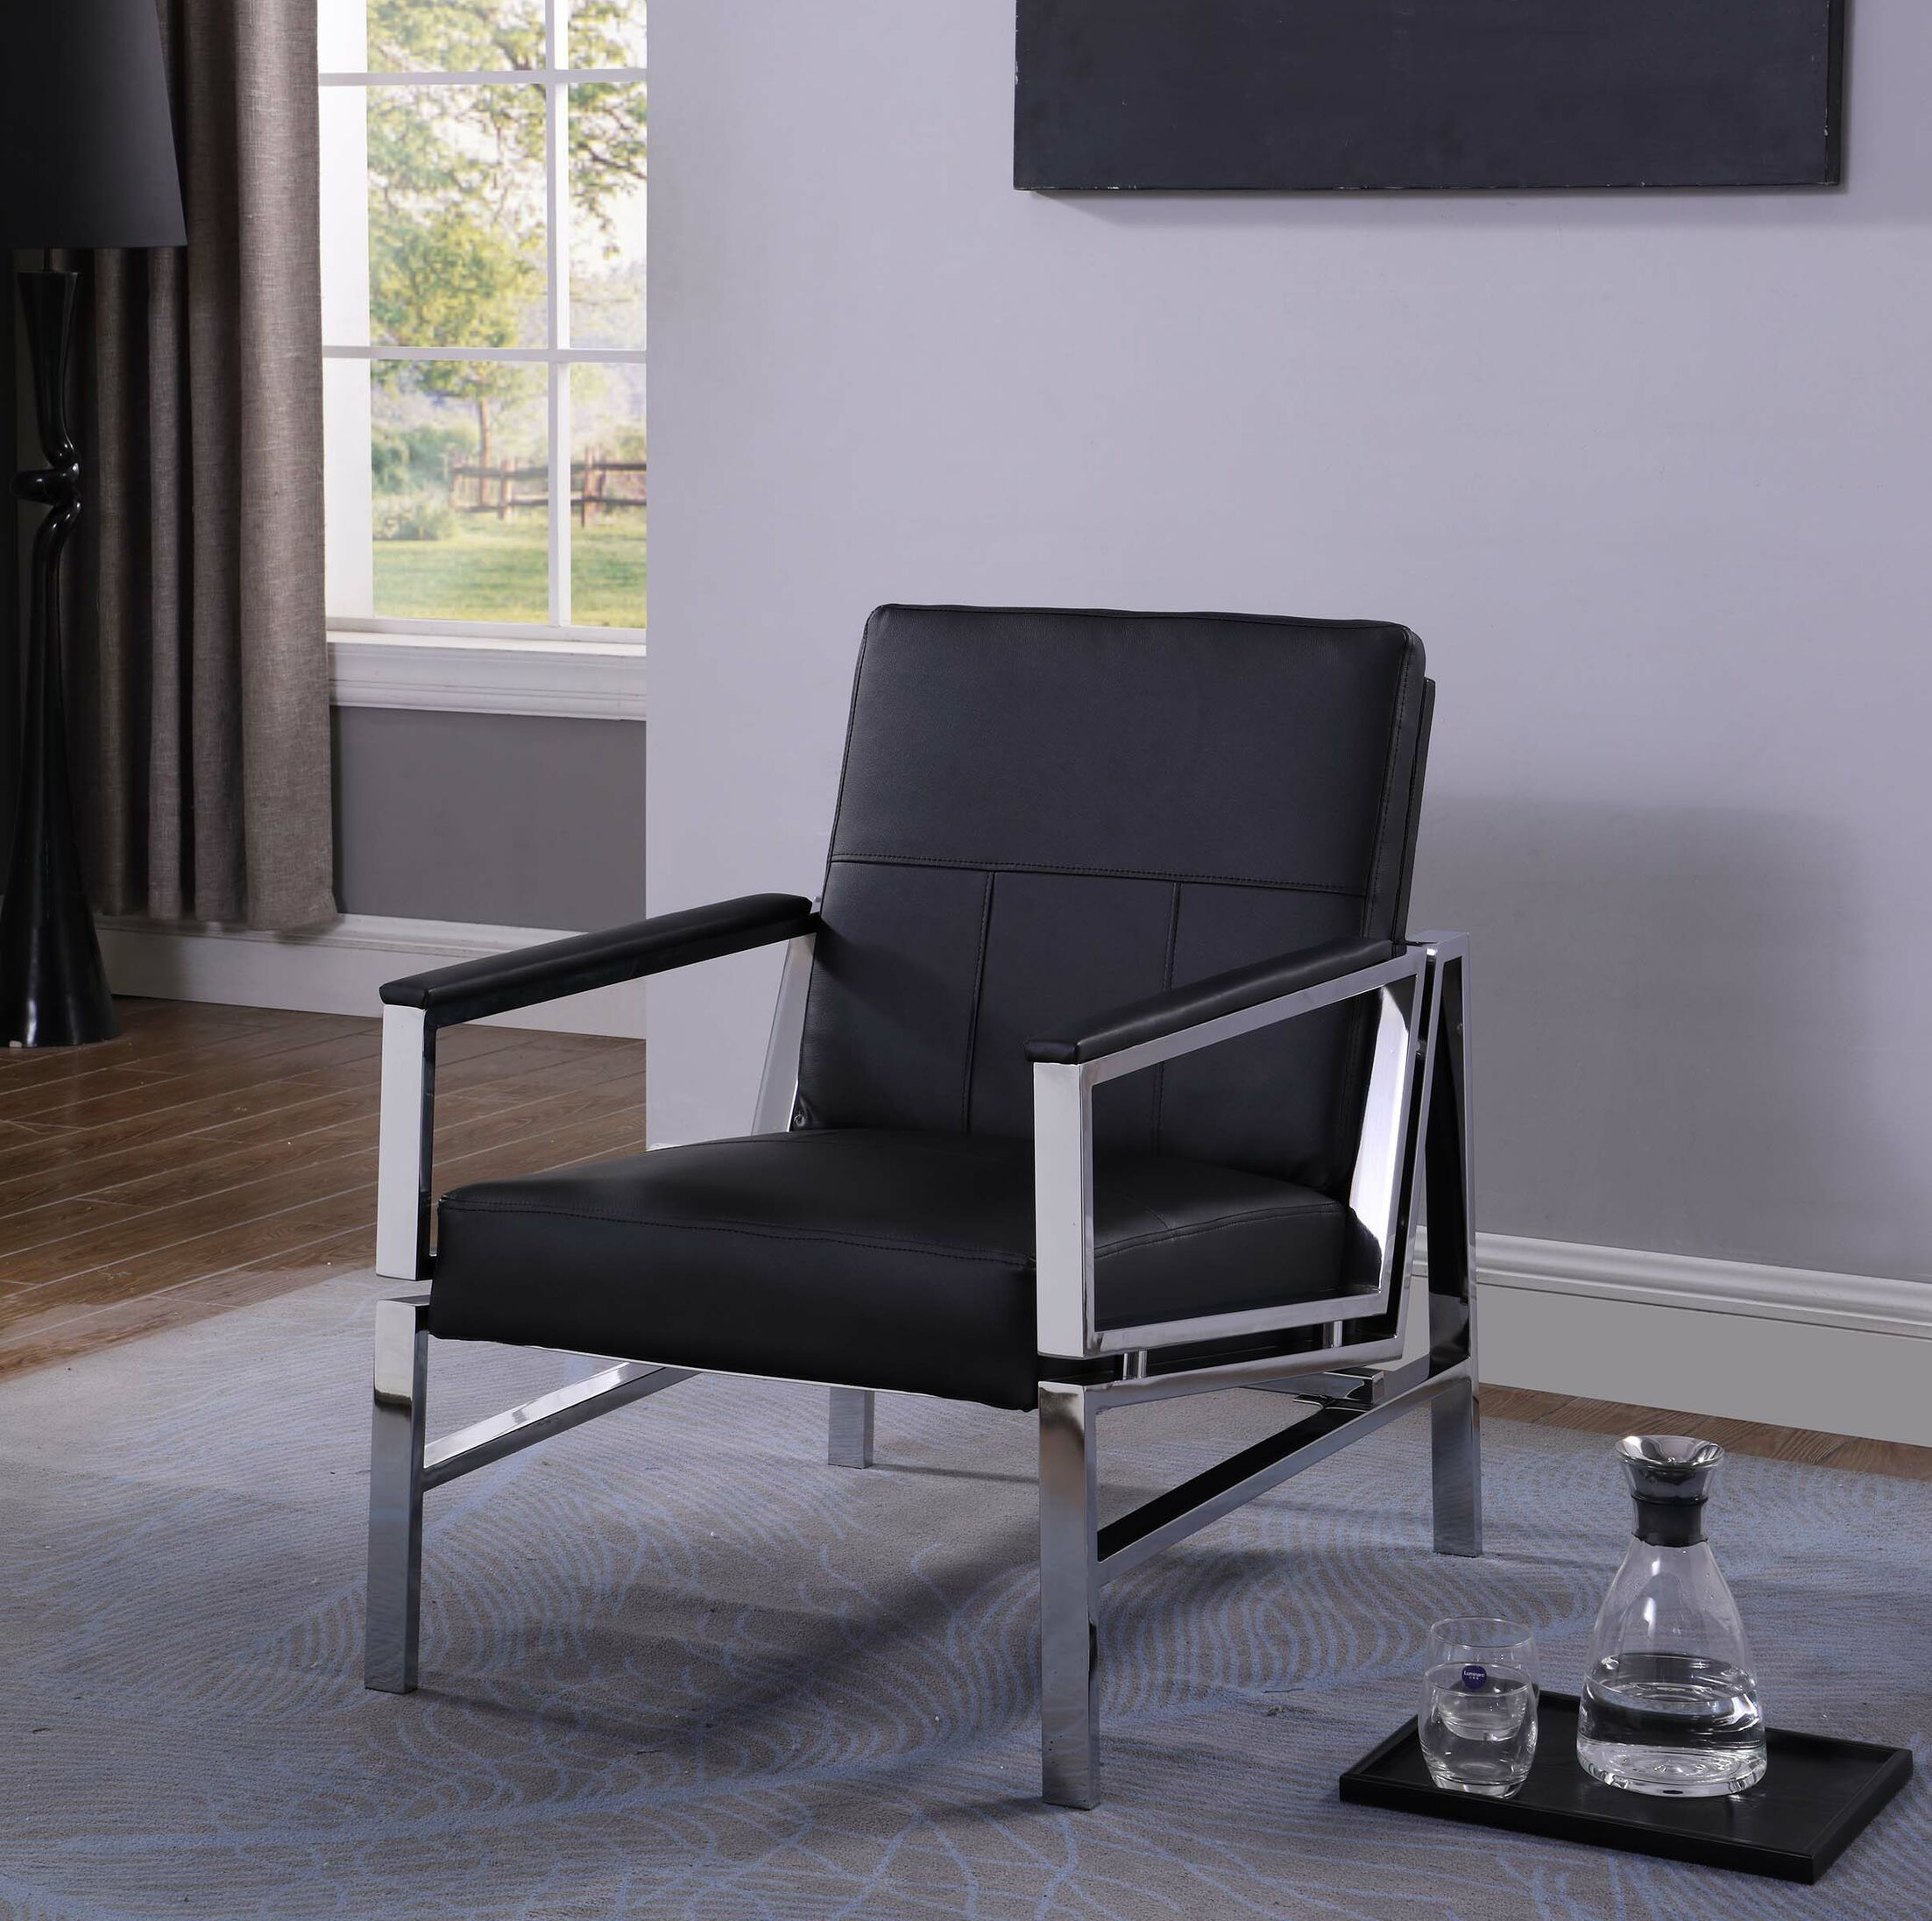 Tingley Modern Stainless Steel Armchair Upholstery: Black